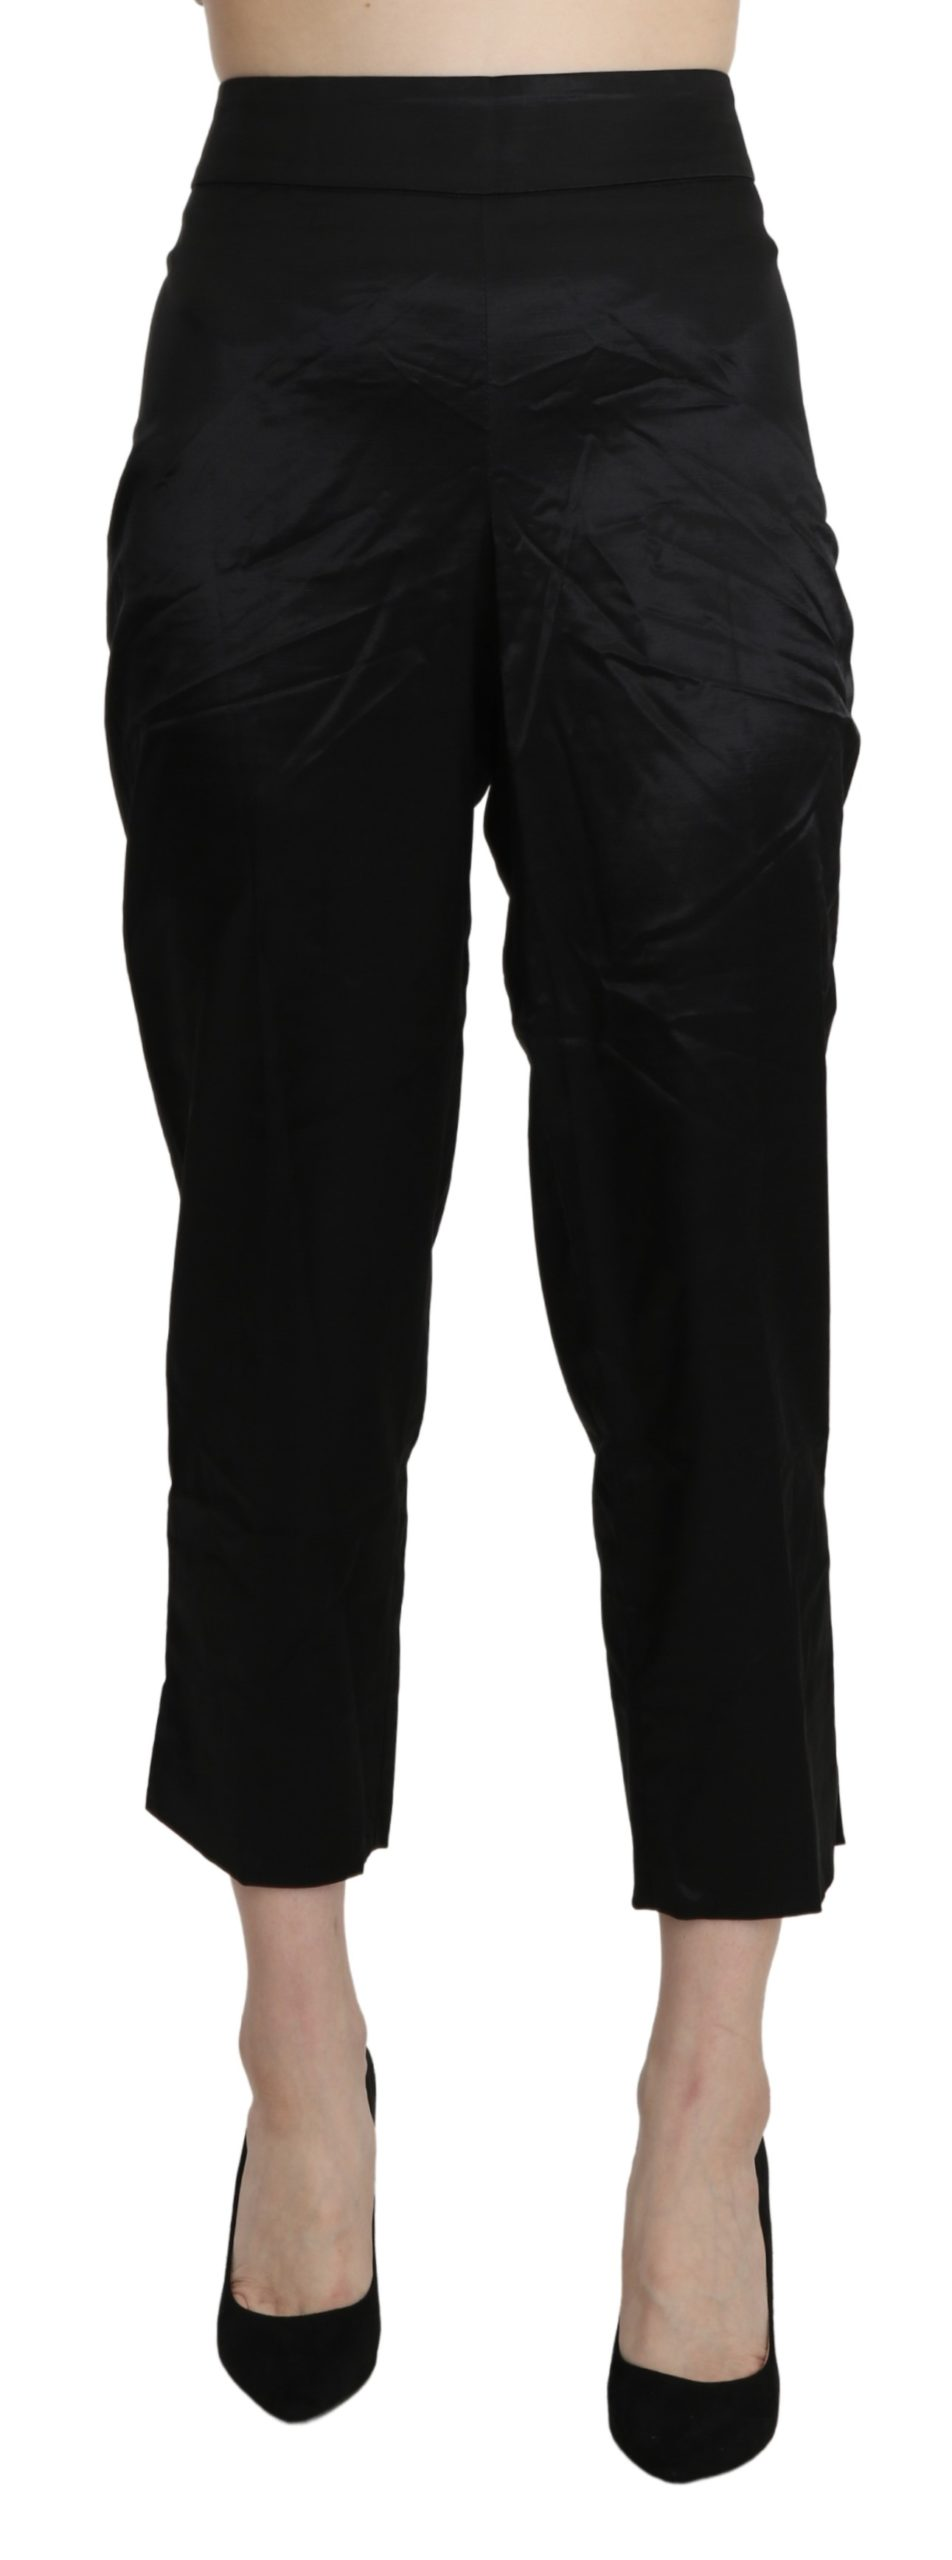 BENCIVENGA Women's High Waist Straight Cropped Trousers Black PAN71330-46 - IT46 XL